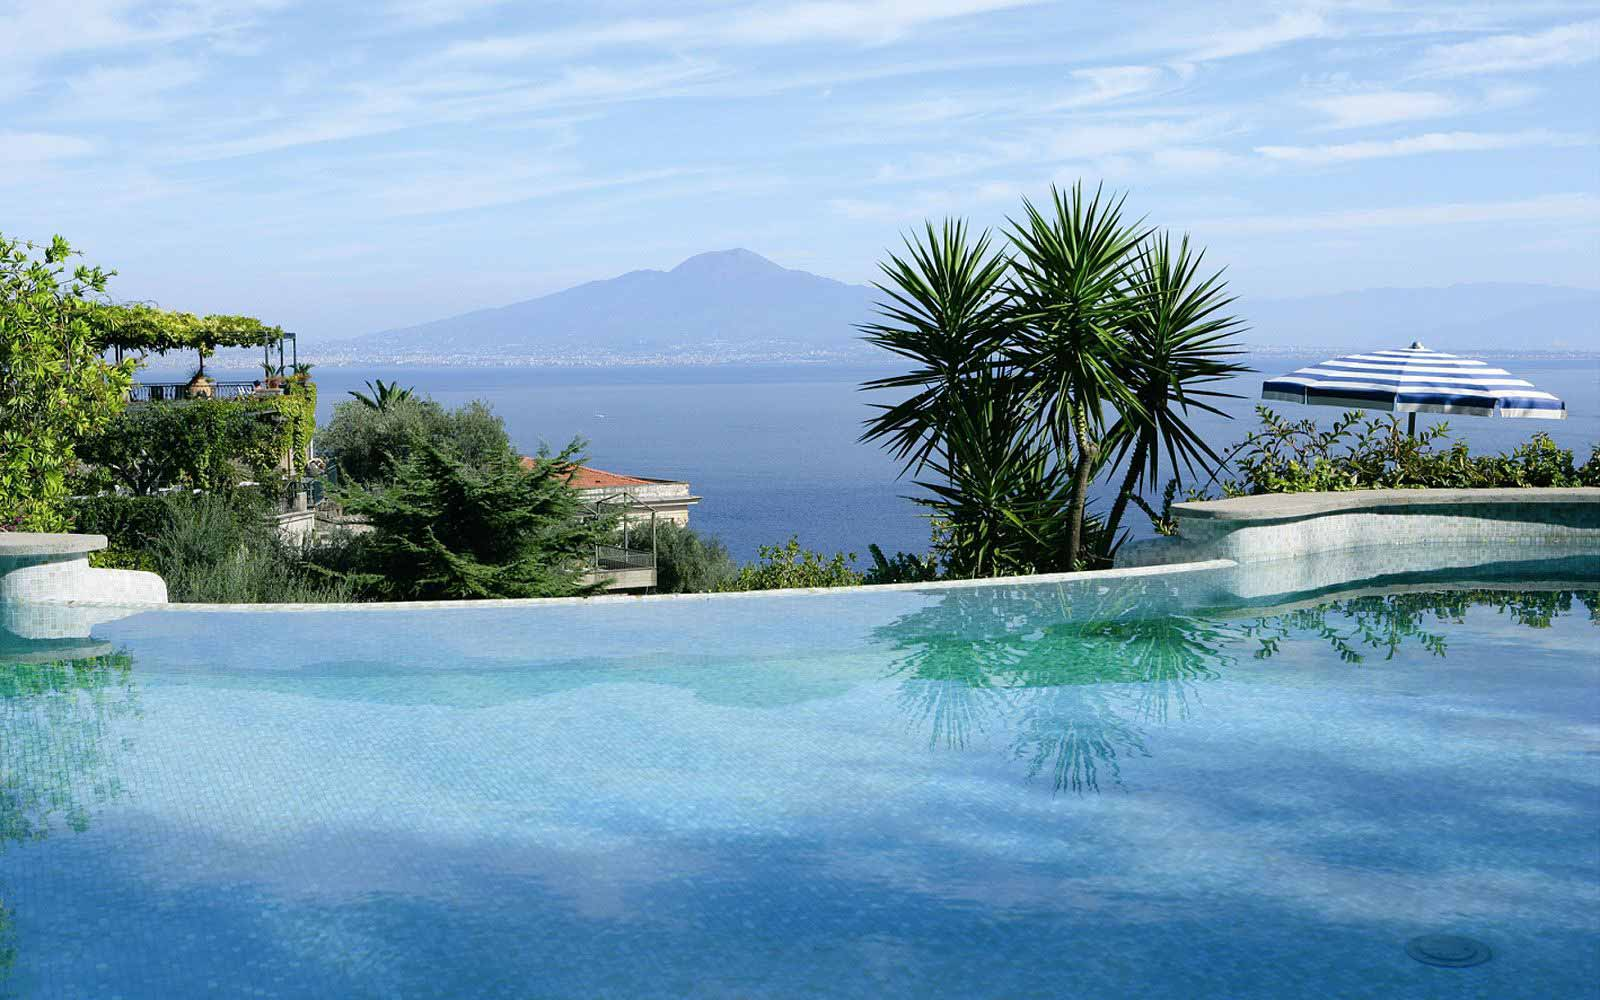 Swimming pool at Grand Hotel Capodimonte with views of Mount Vesuvius